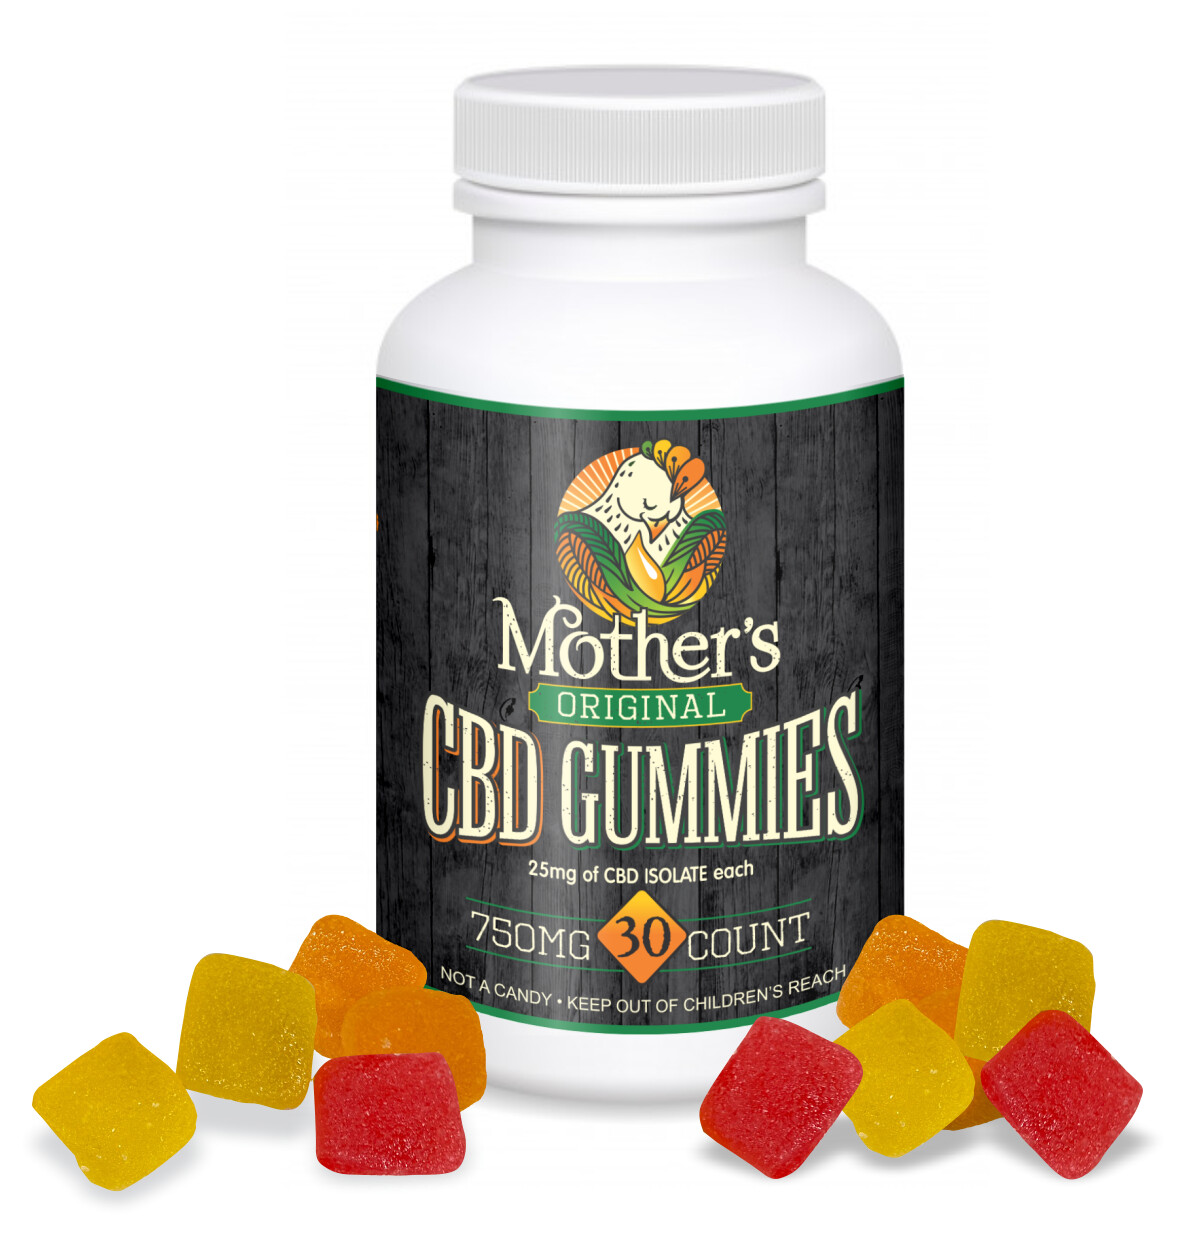 Mother's CBD Gummies